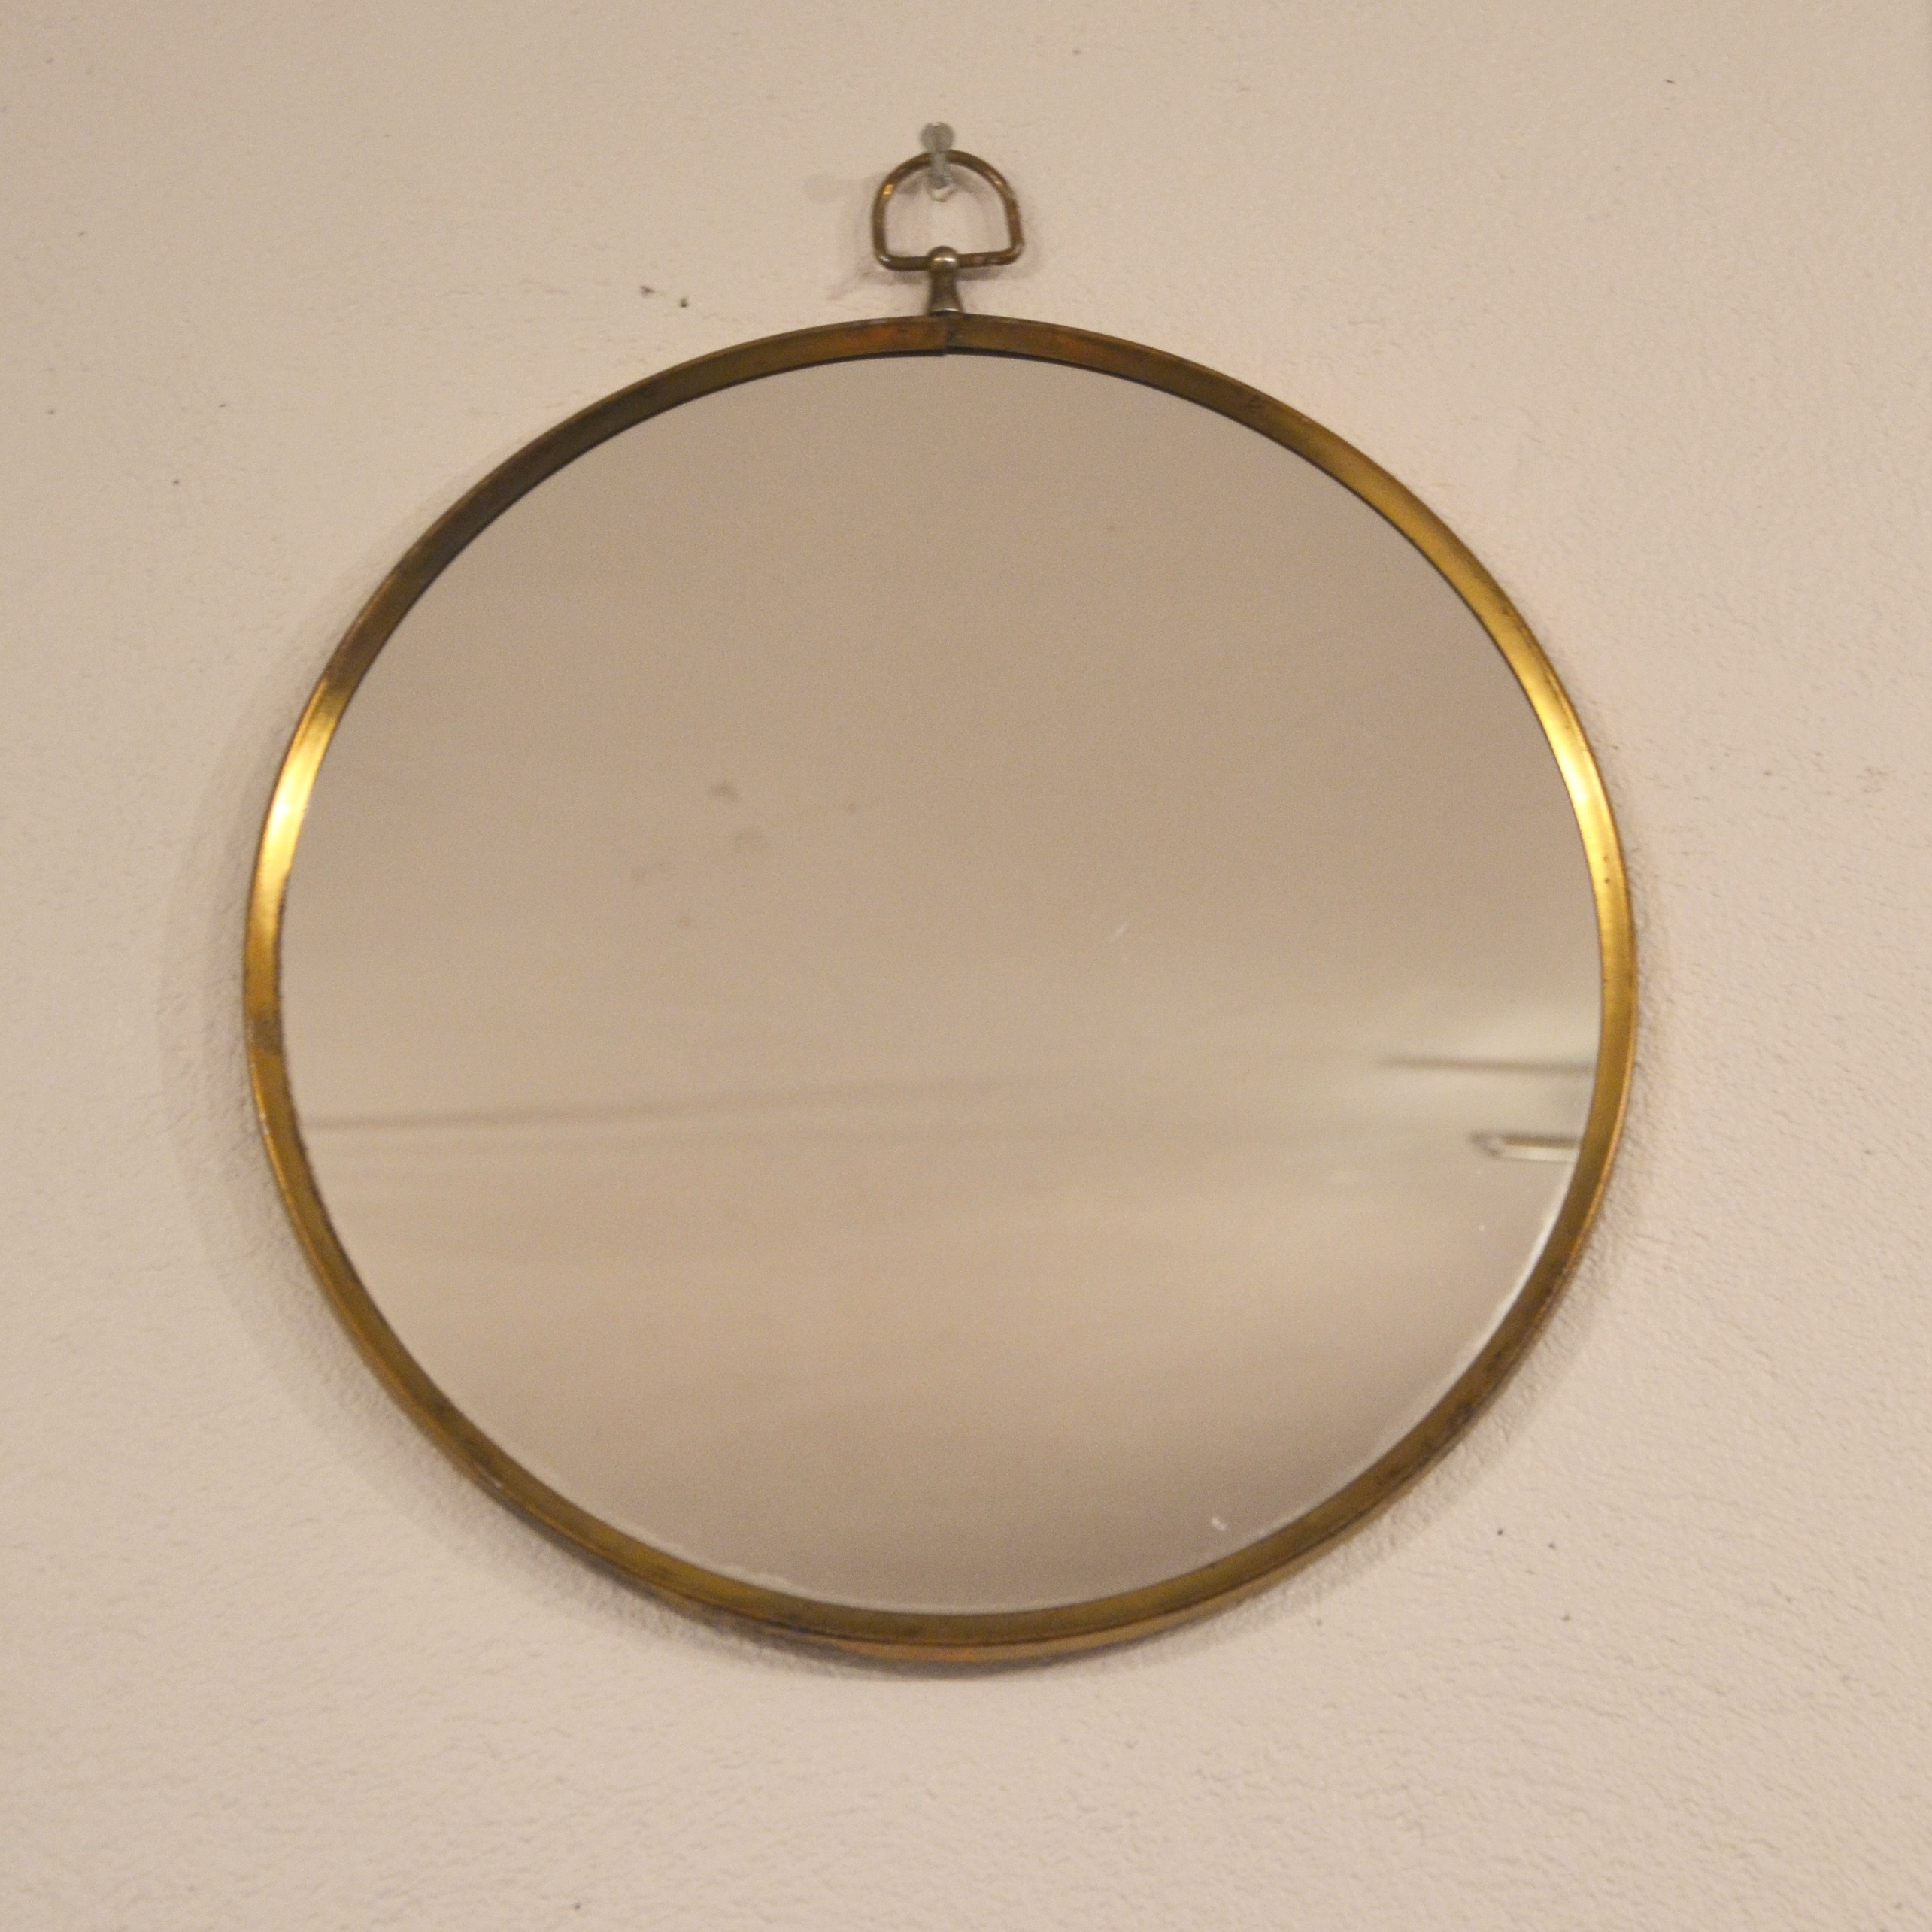 miroir rond cercl de laiton bindiesbindies. Black Bedroom Furniture Sets. Home Design Ideas